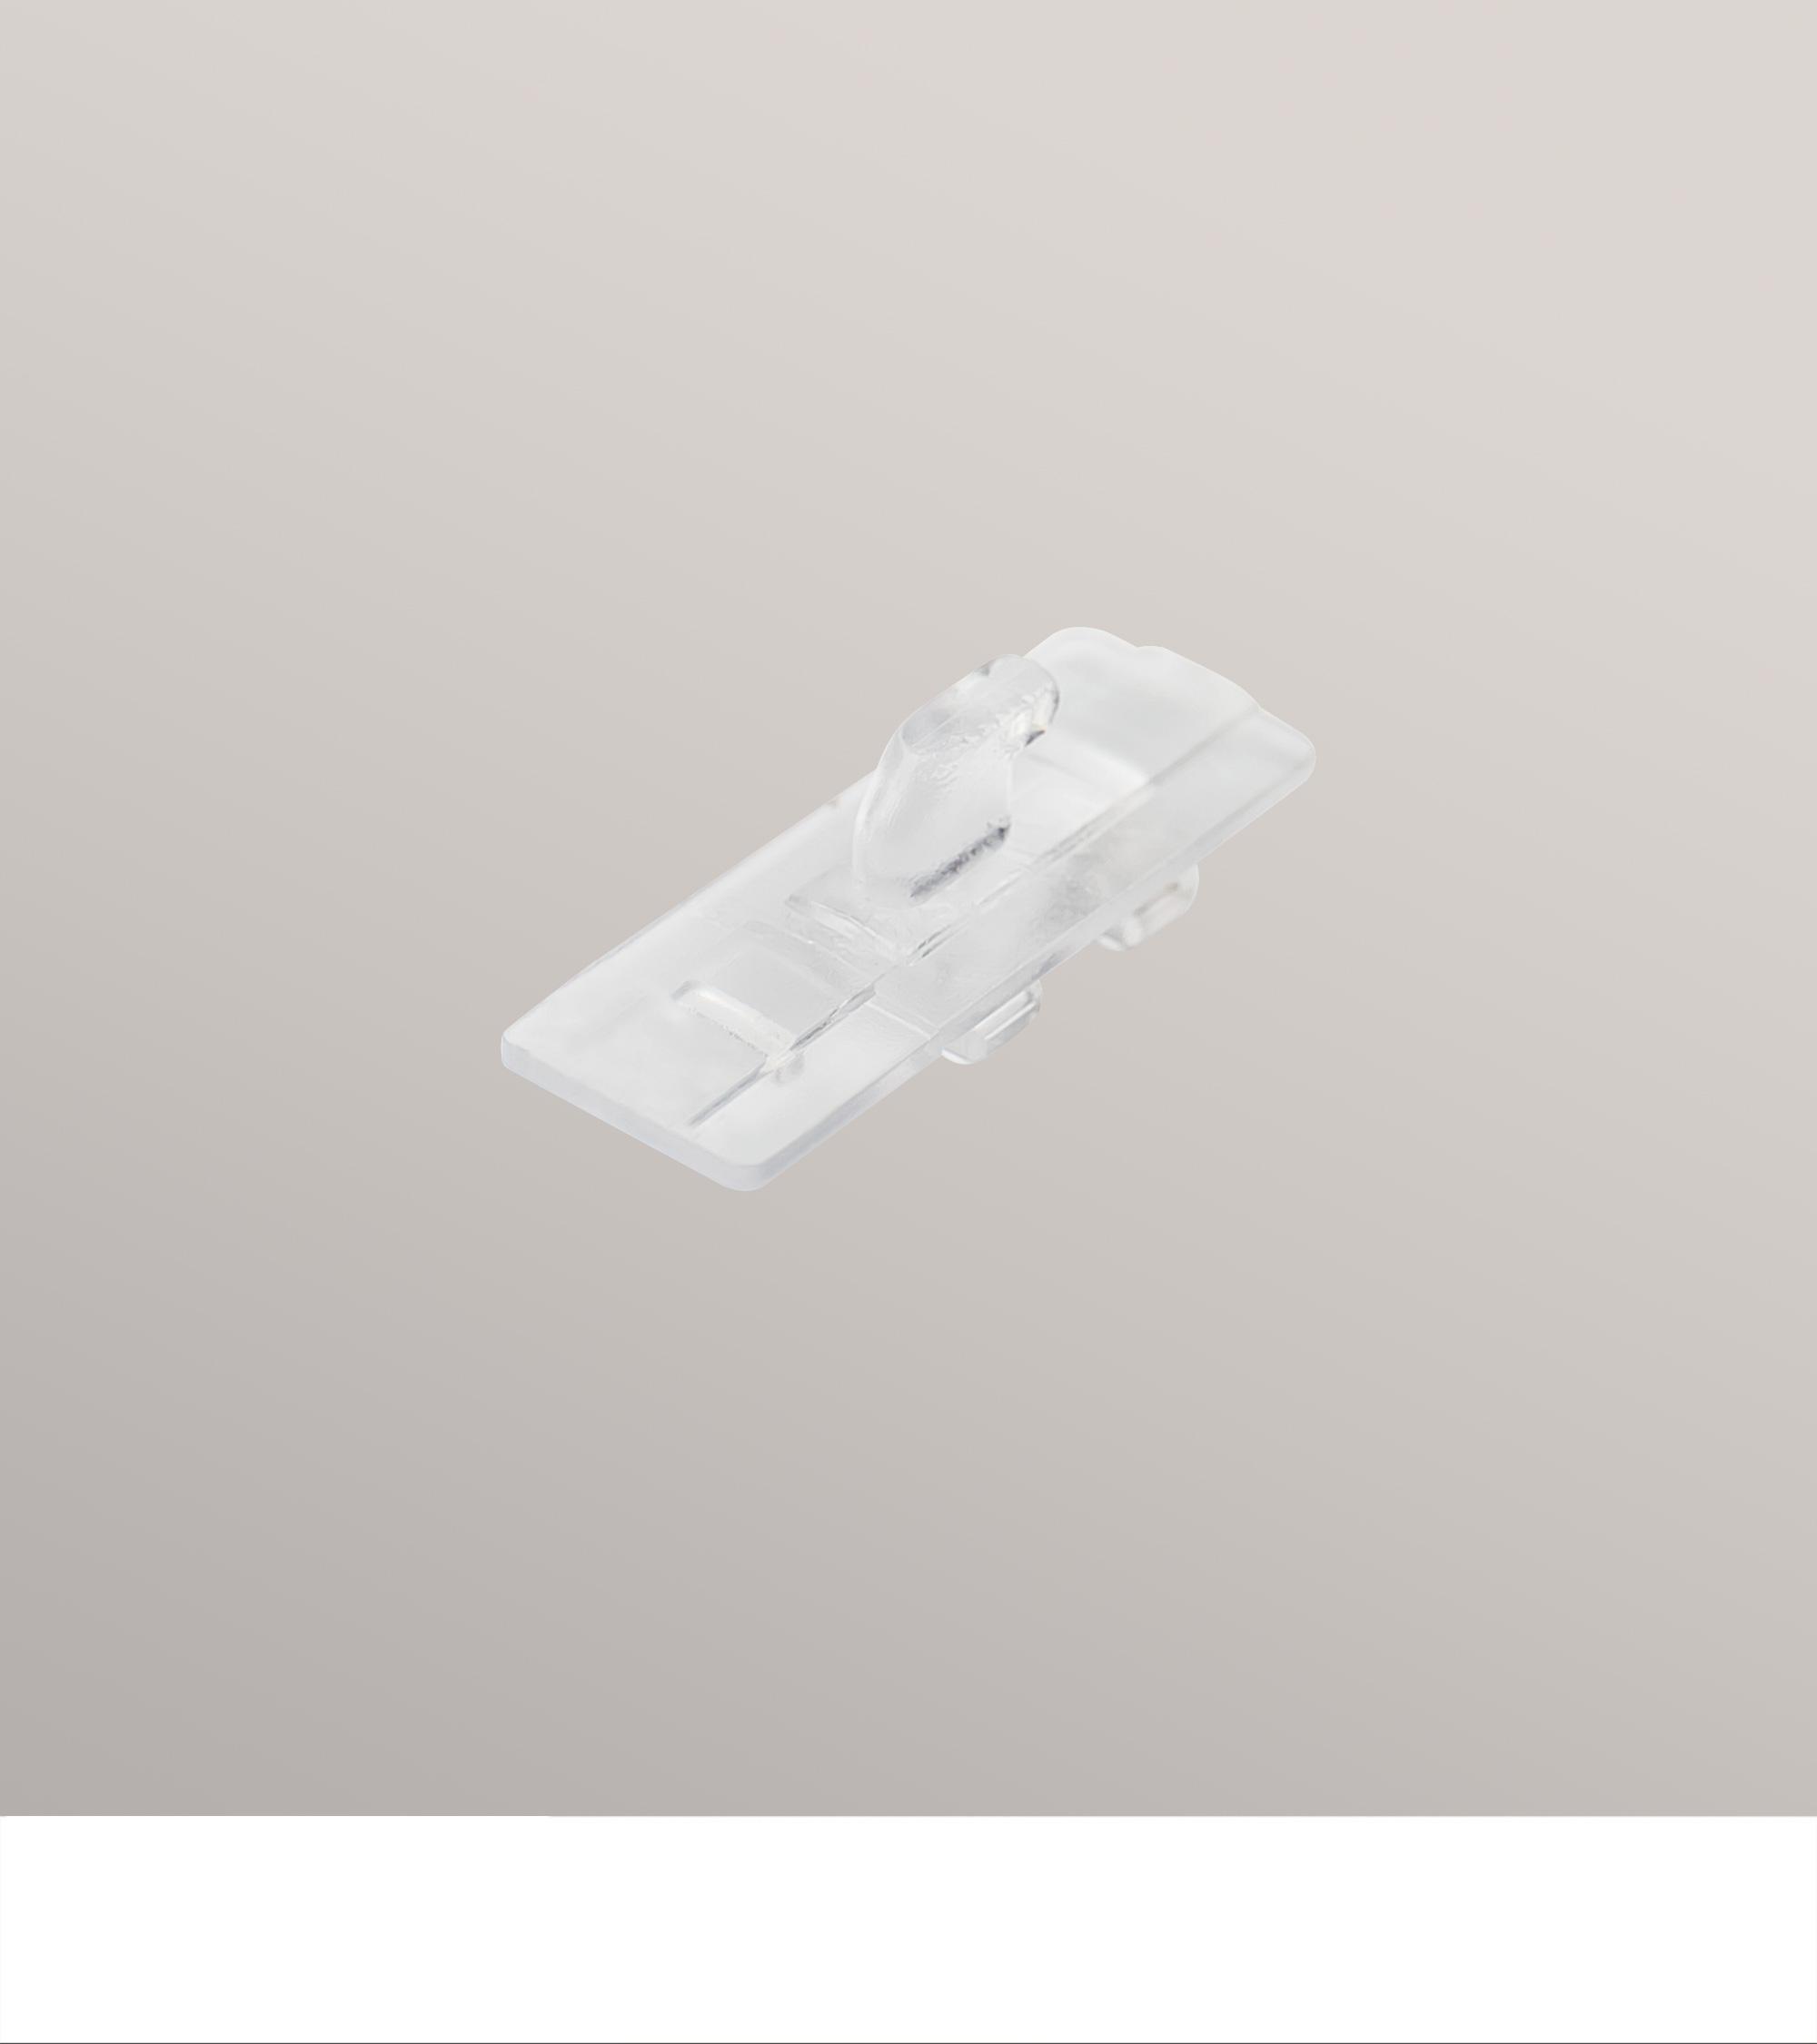 adapter f r klemmtr ger exklusiv cosiflor zur befestigung ihres cosiflor plissees. Black Bedroom Furniture Sets. Home Design Ideas